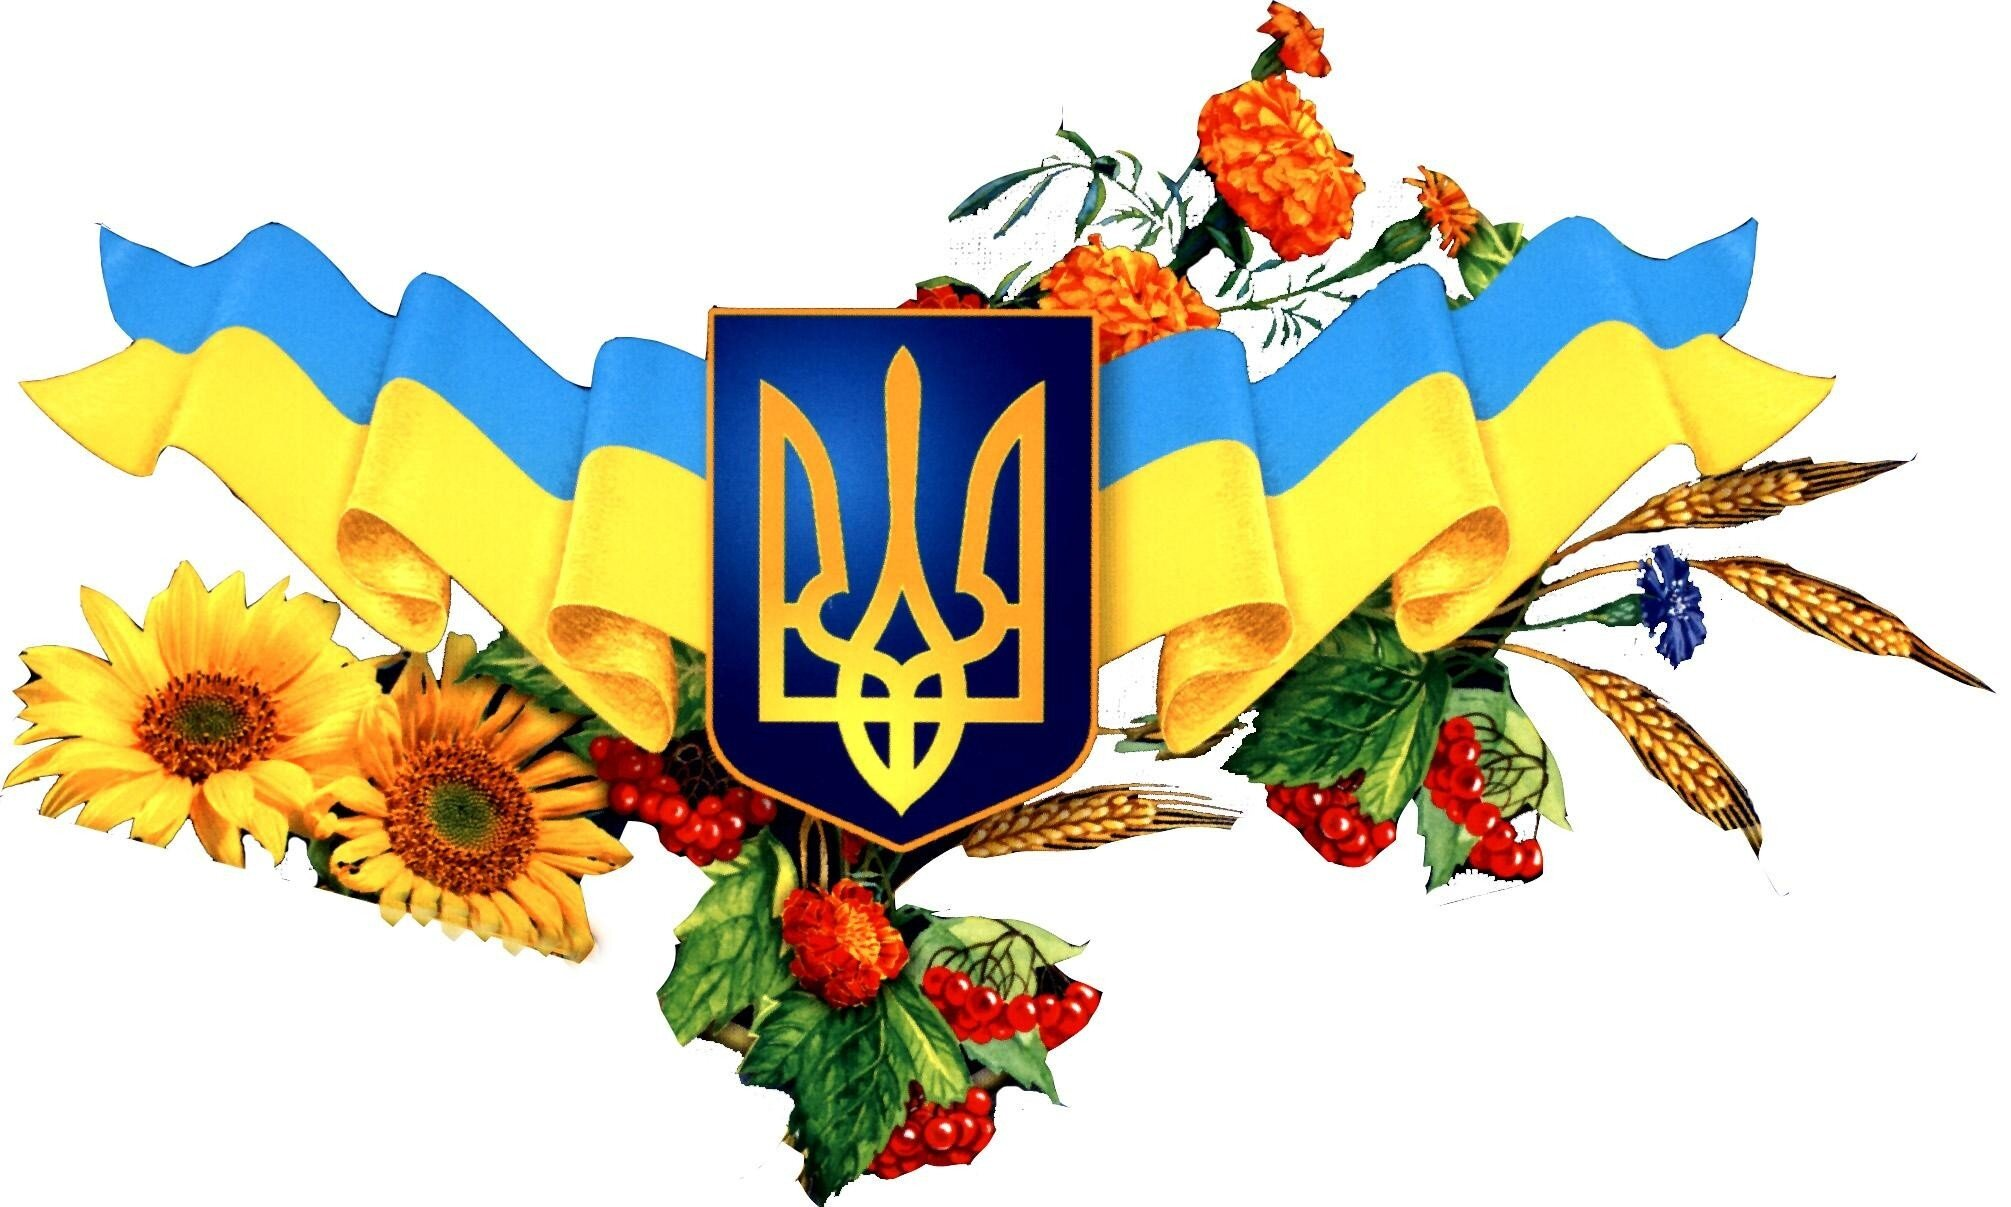 Патриотические картинки украина, открытки маме открытки